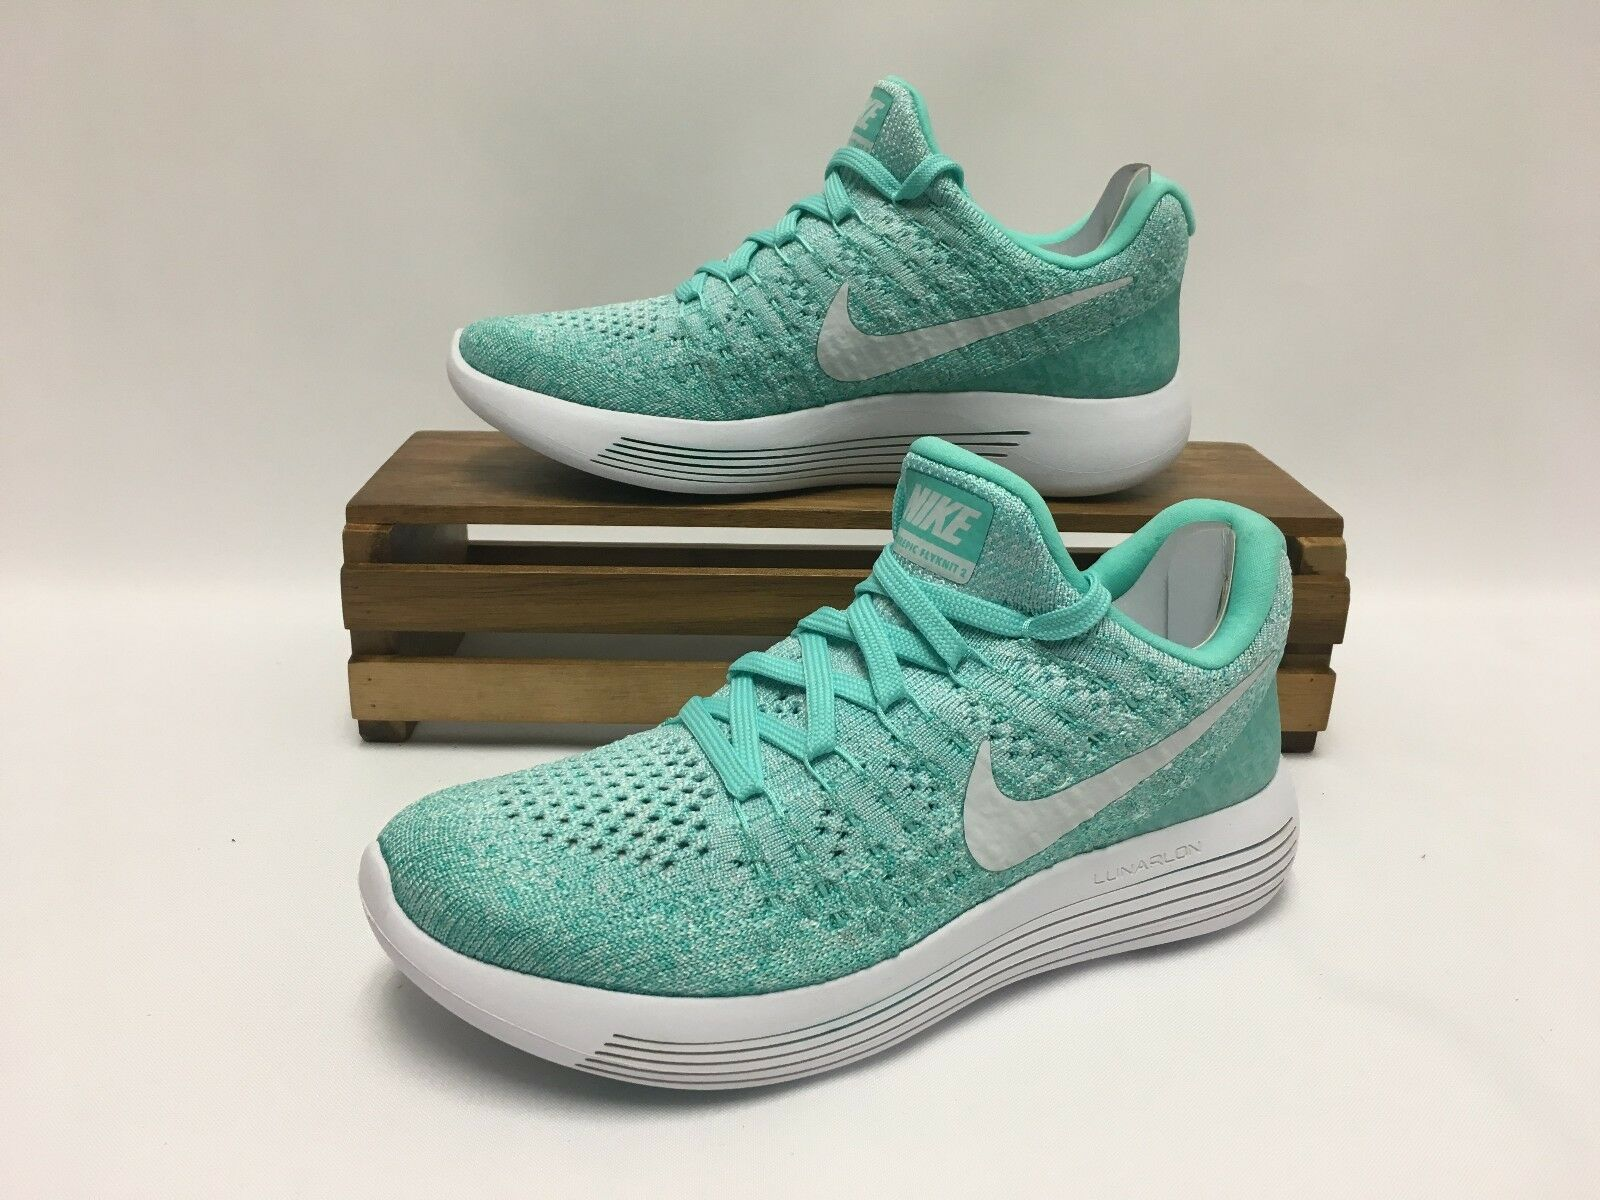 Nike Lunarepic Low Flyknit 2 Running Shoes 863780-301 Women's Size 5 NEW